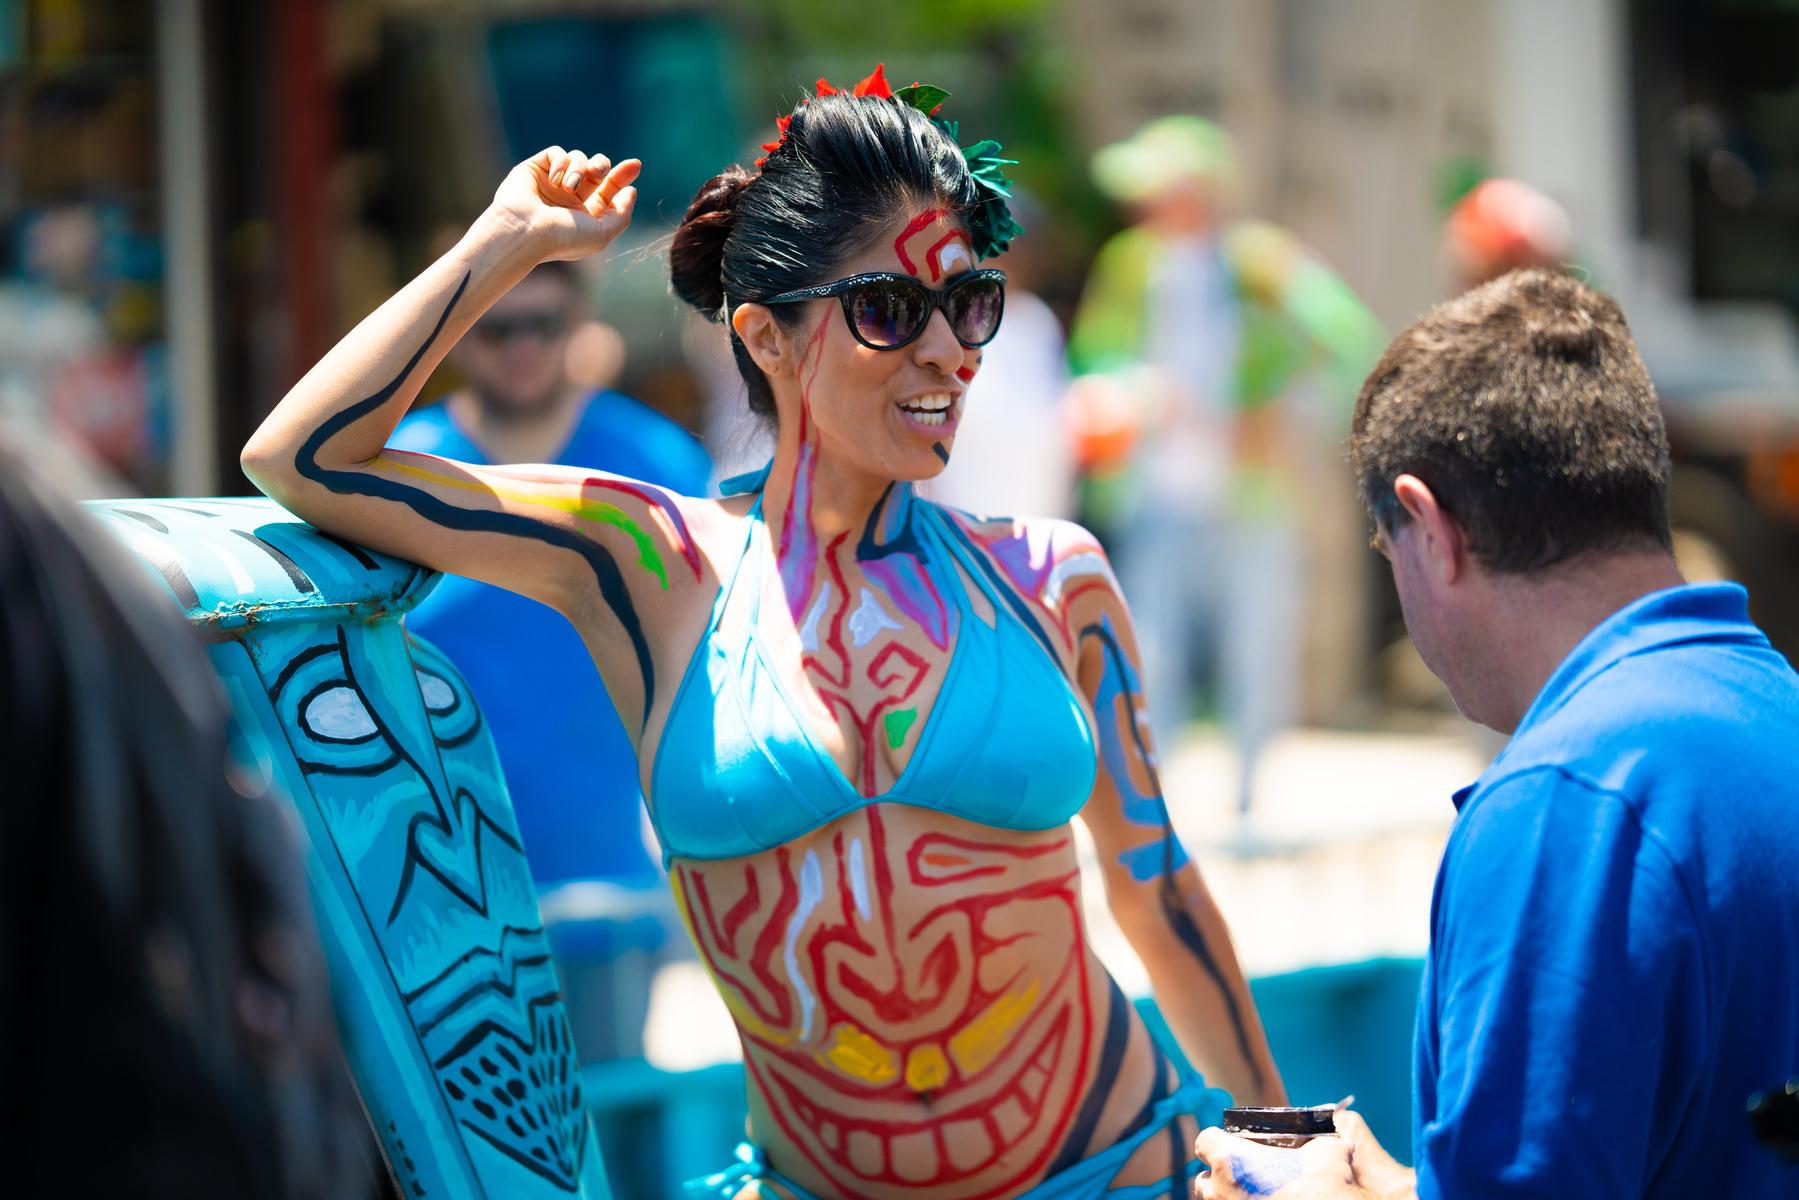 Coney Island Mermaid Parade 2018 (33).jpeg